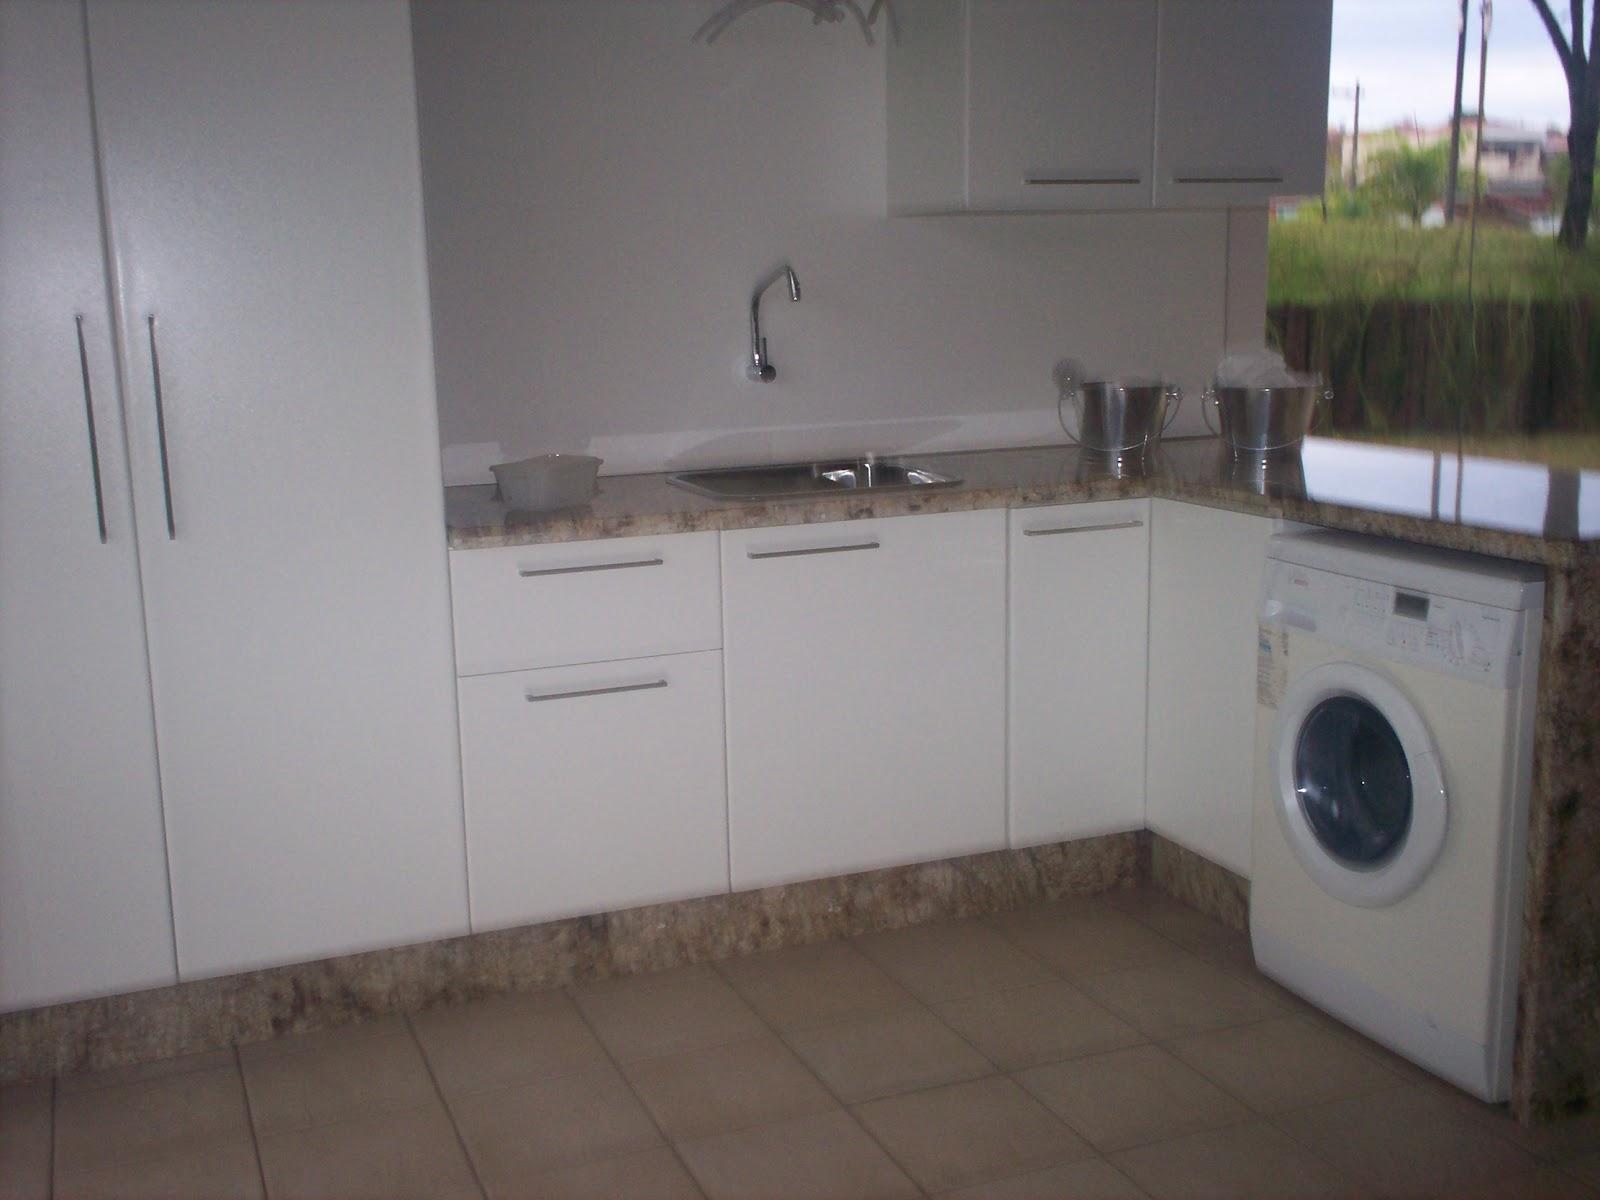 Lavanderie des photos des photos de fond fond d'écran #665B4D 1600x1200 Banheiro Com Pastilhas Roxas